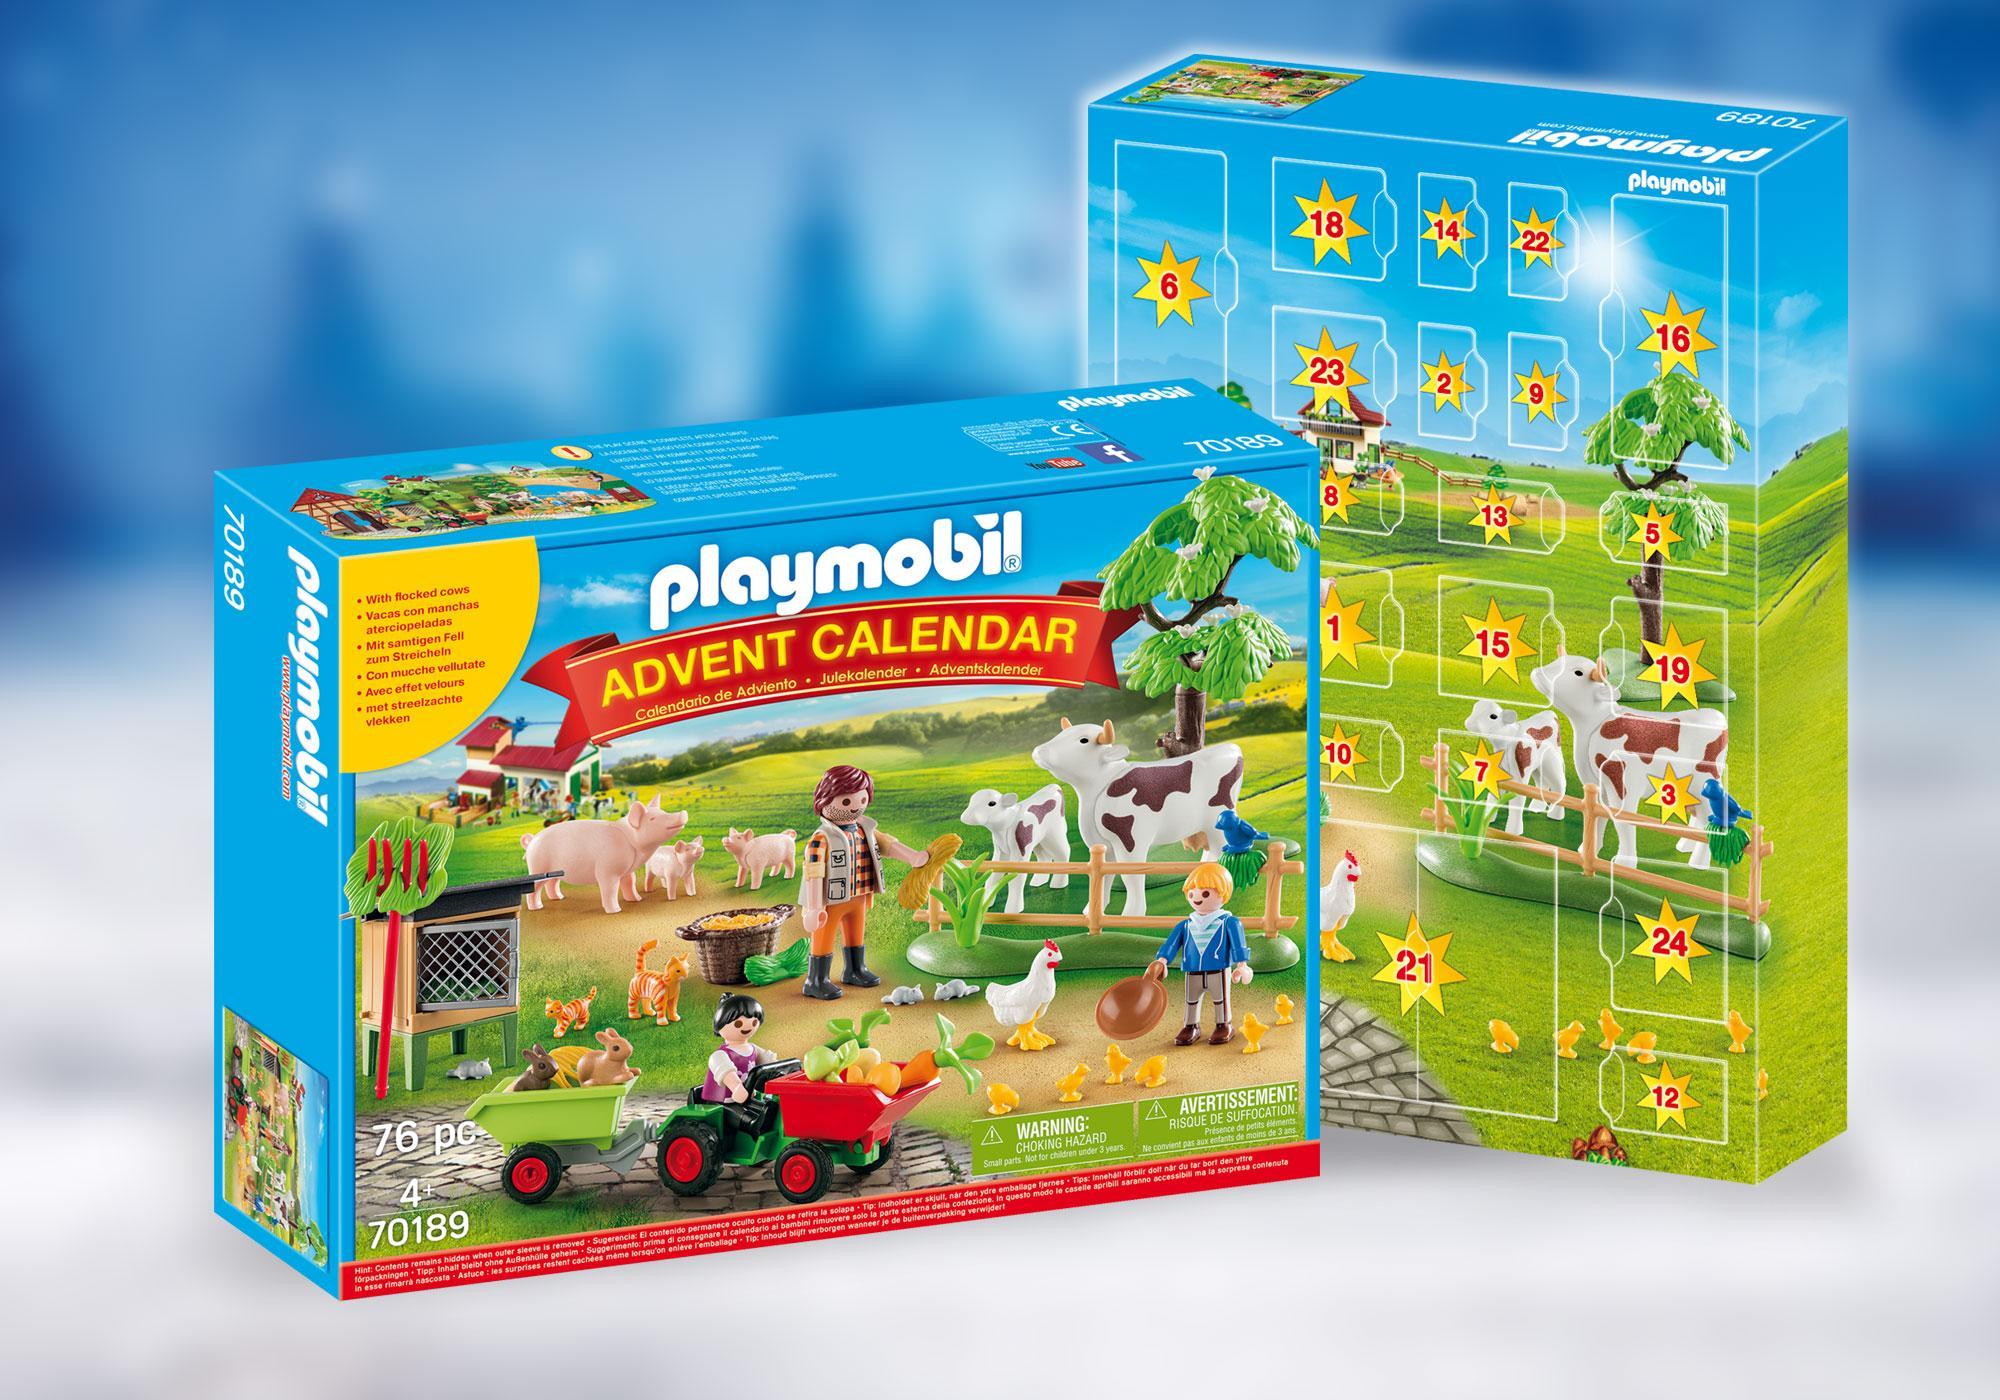 http://media.playmobil.com/i/playmobil/70189_product_detail/Advent Calendar - Farm